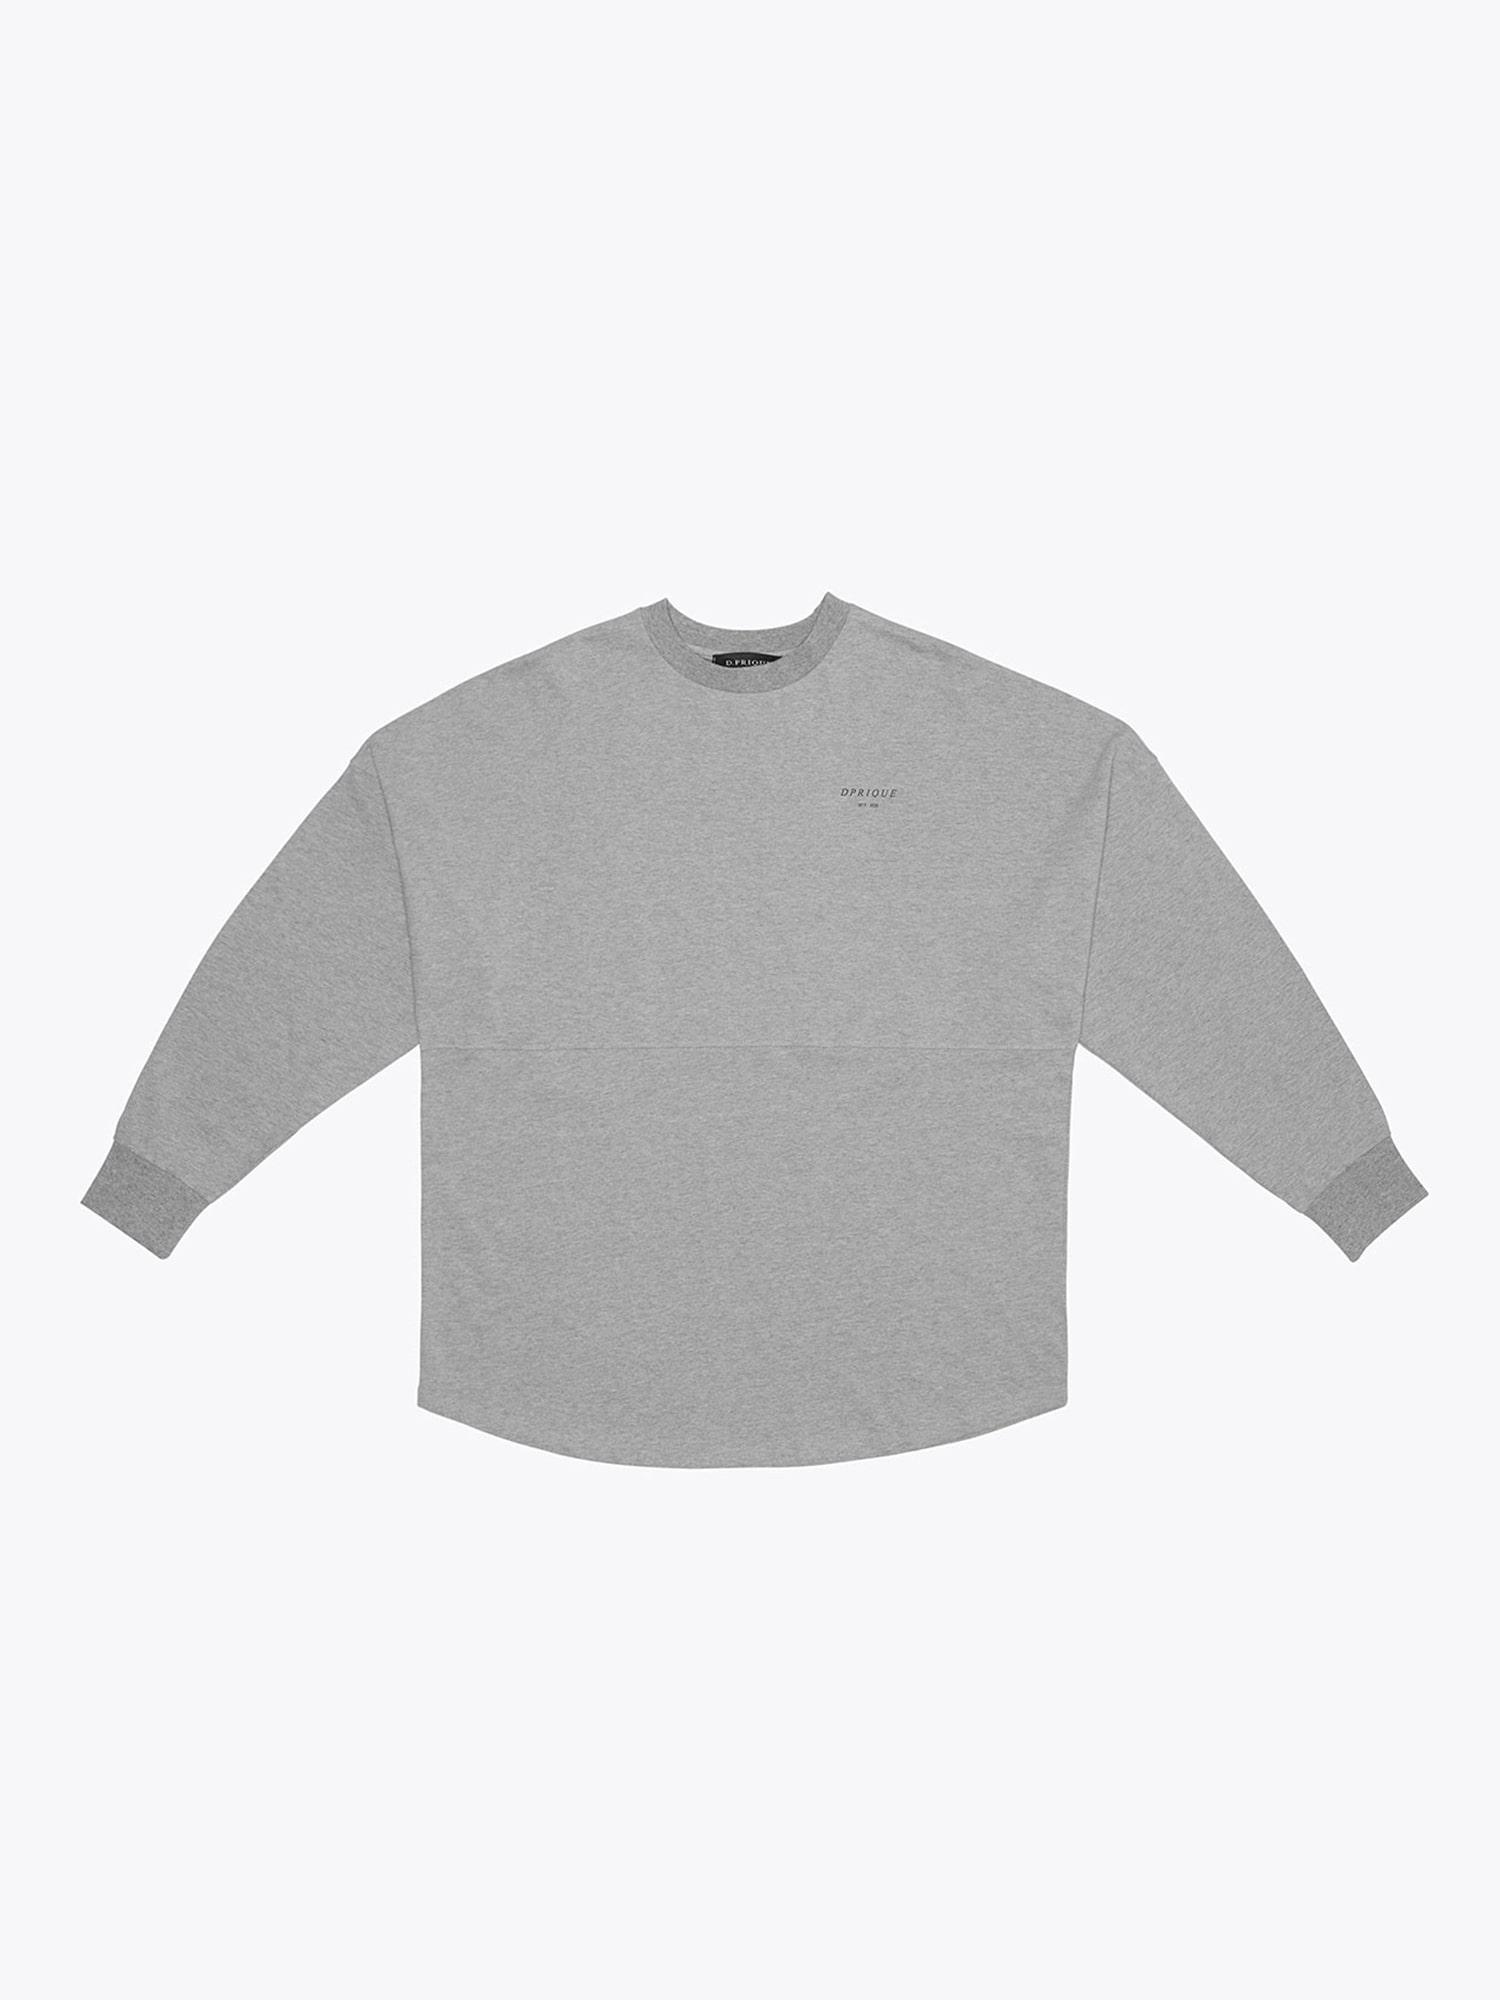 Crew Neck T-Shirt- Grey